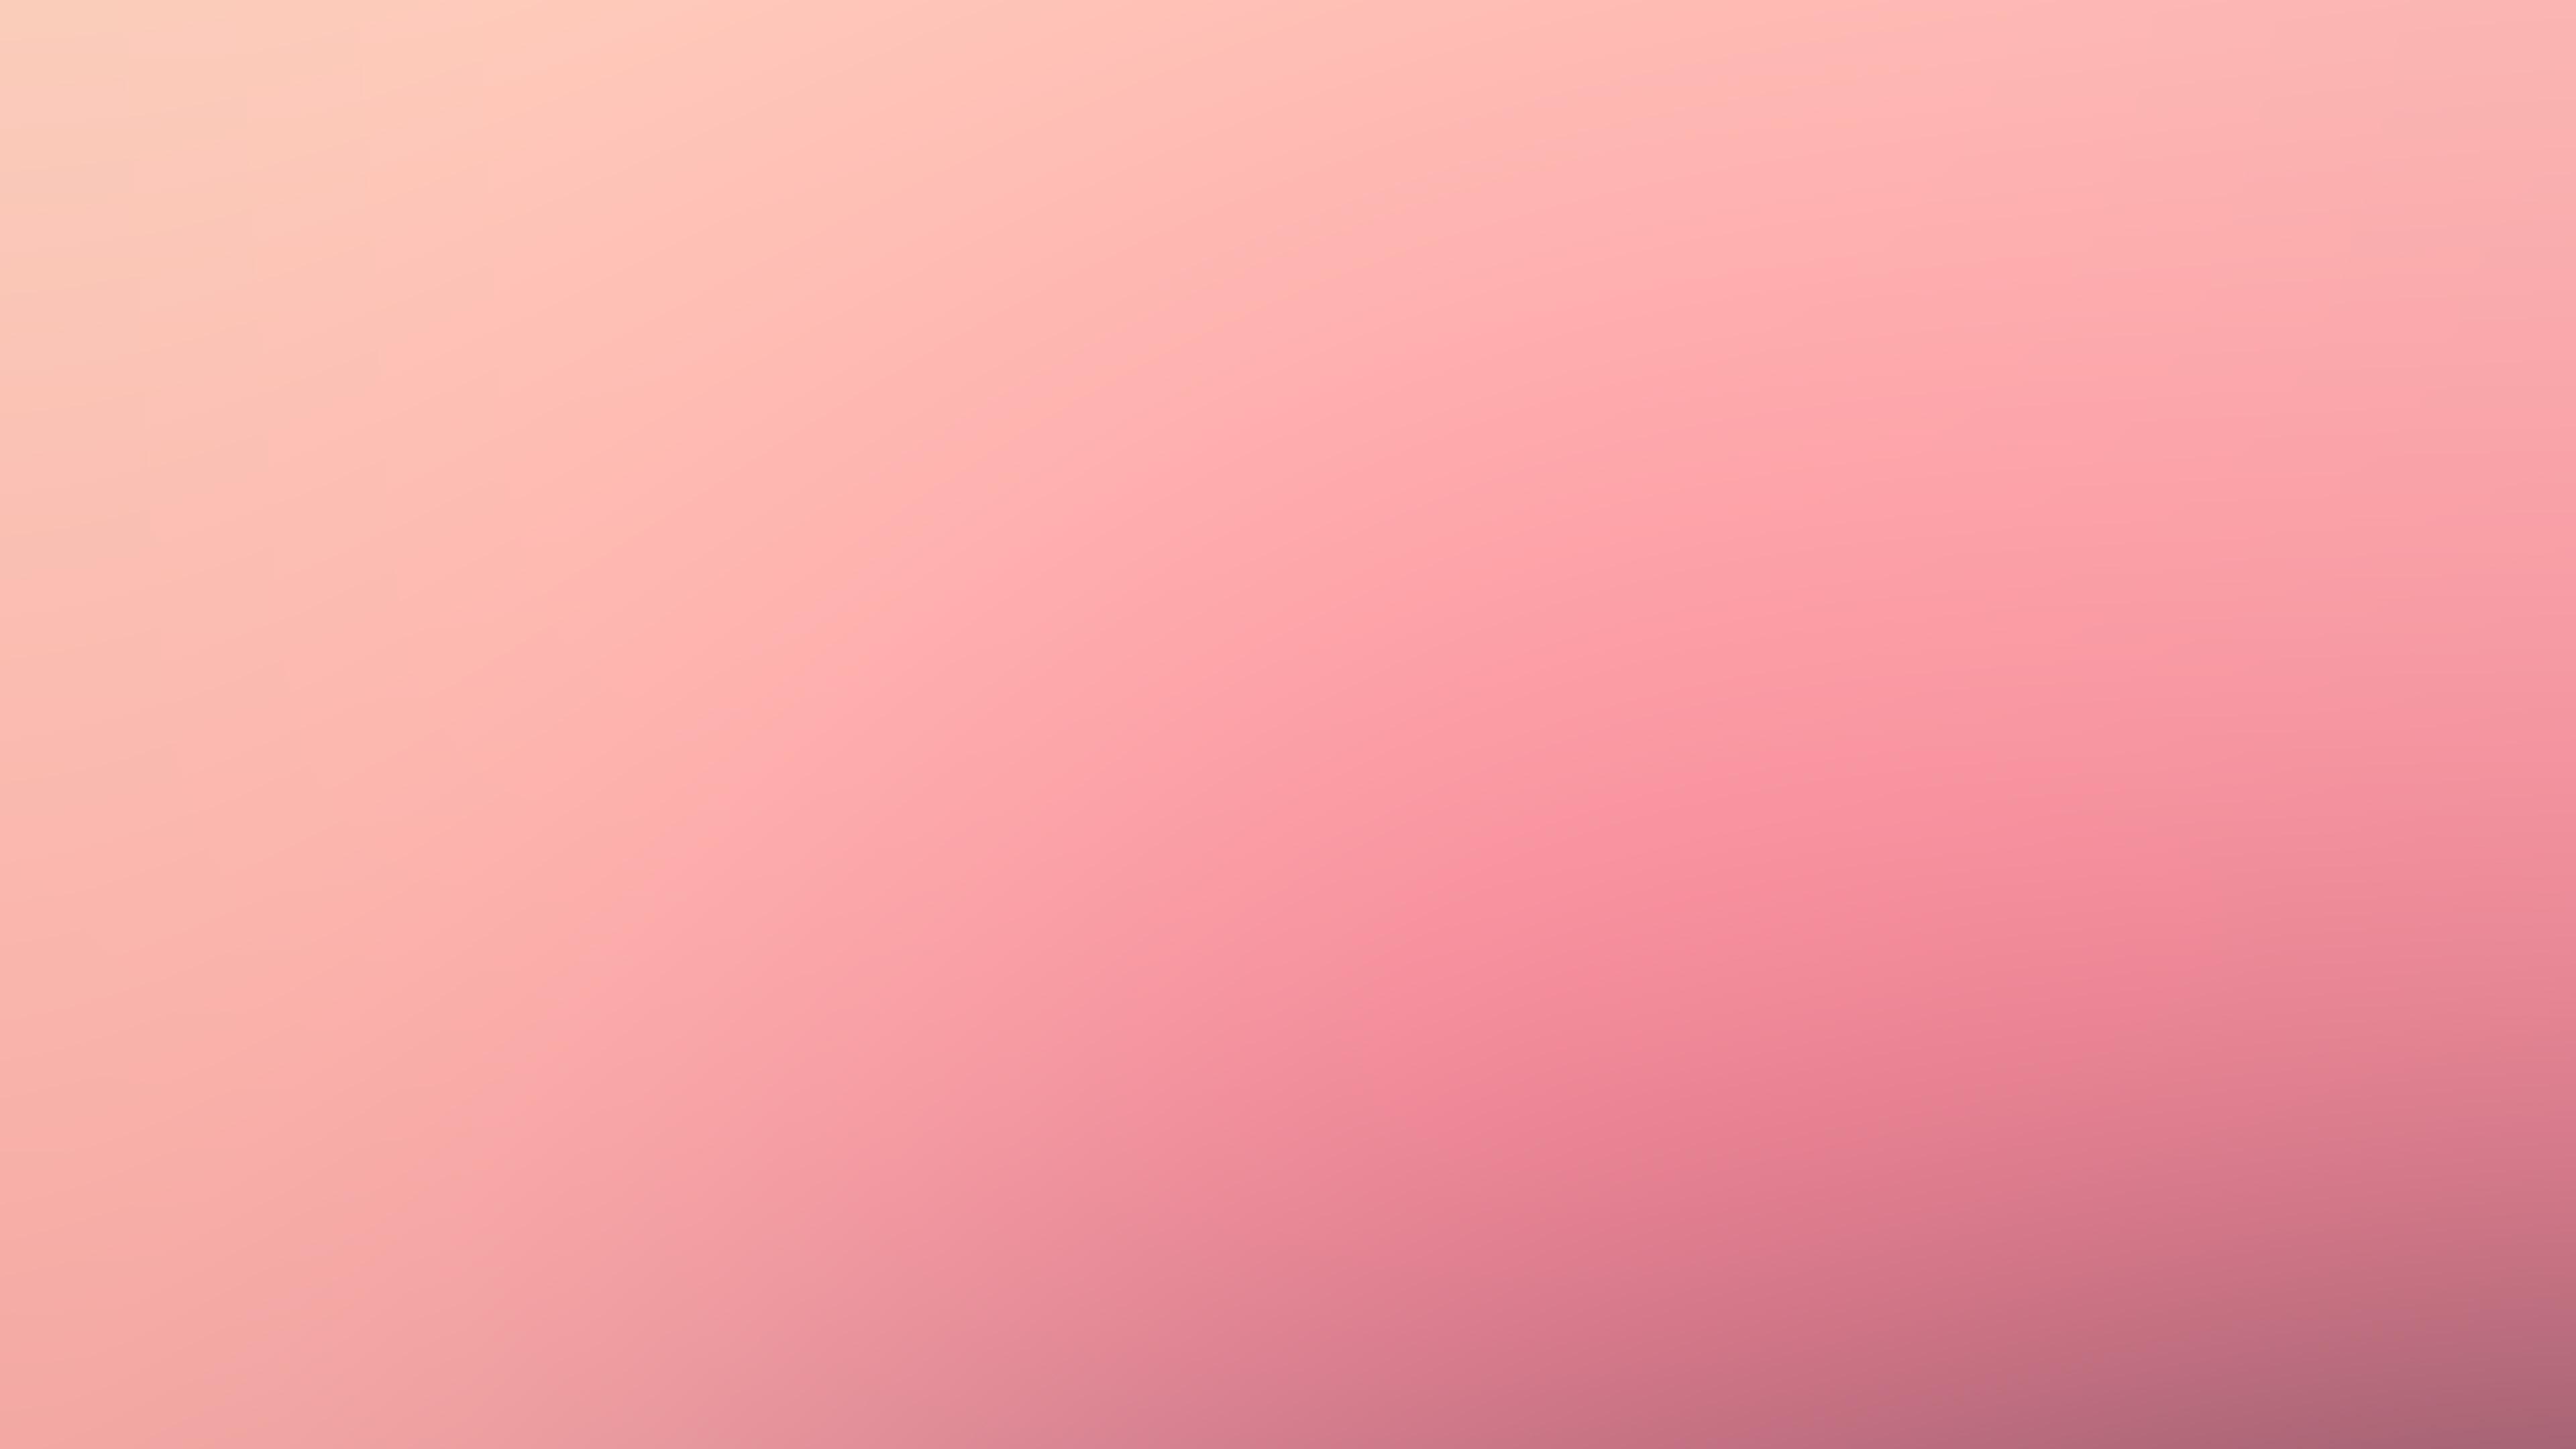 sg71-orange-pink-rosegold-soft-night-gradation-blur ...